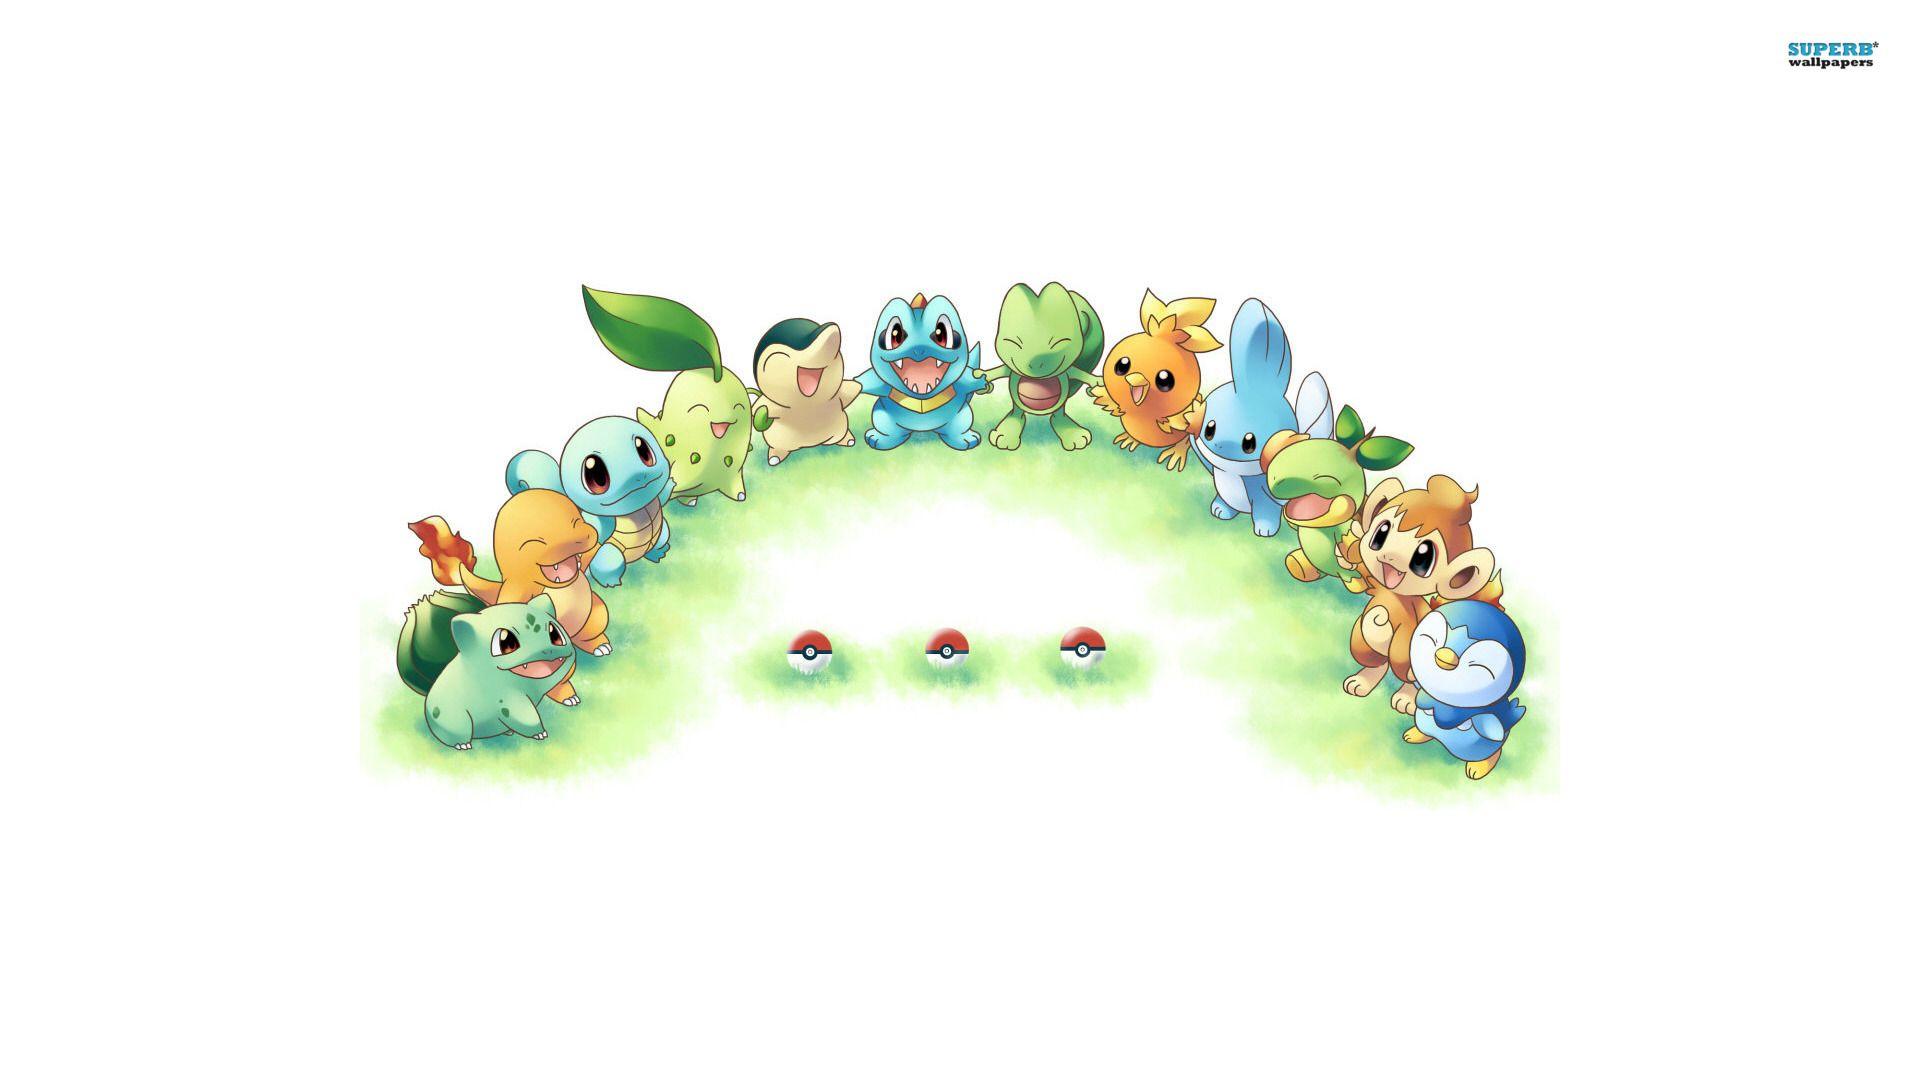 Anime Pokemon Wallpaper